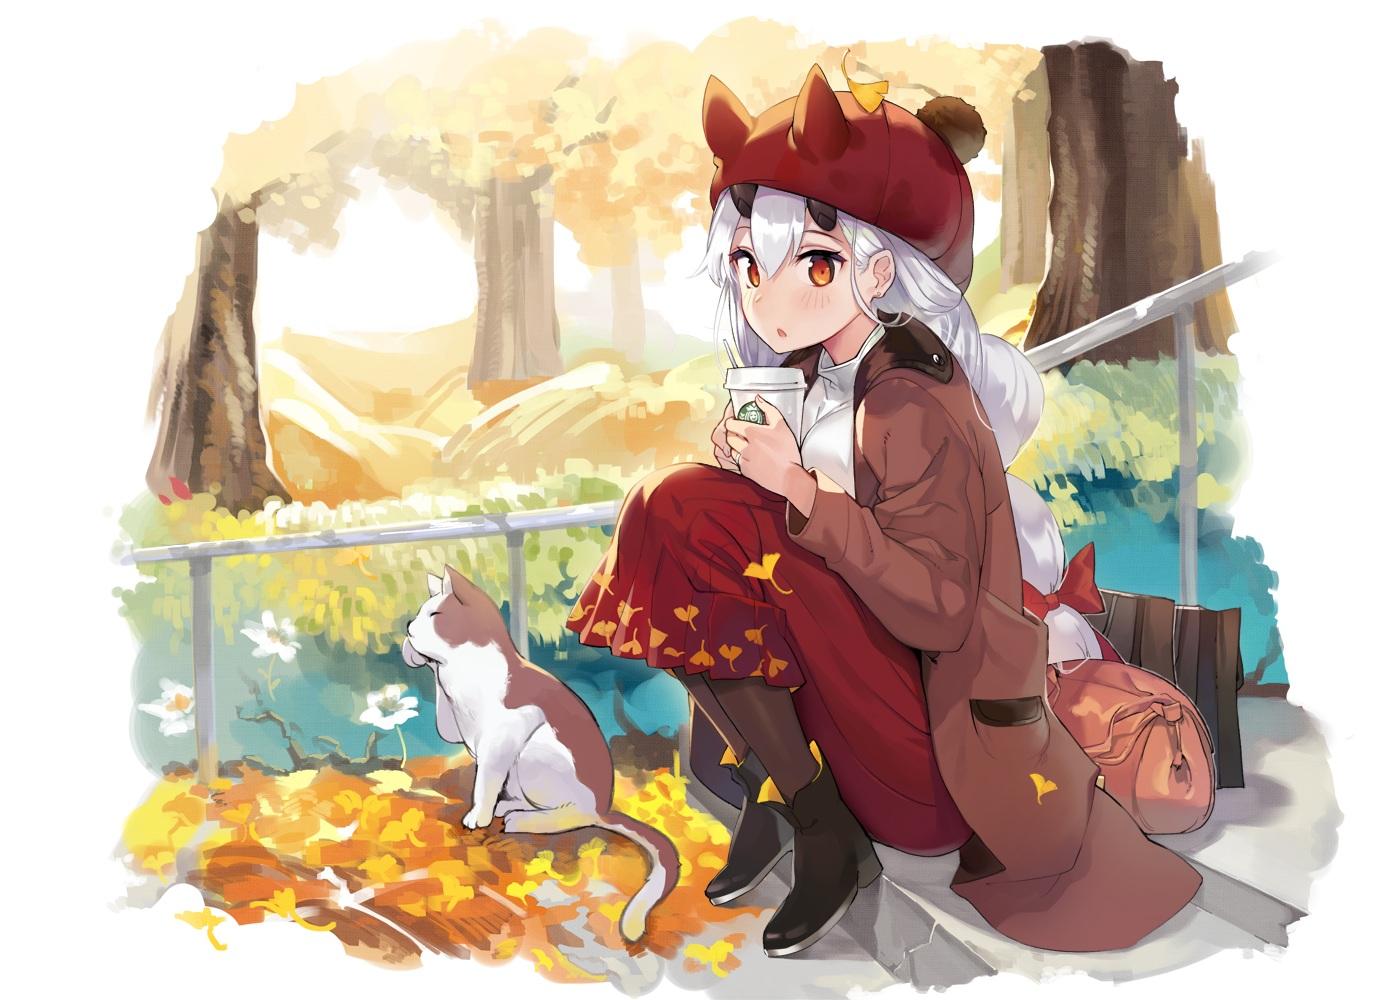 animal autumn blush boots cat drink fate/grand_order fate_(series) hat horns jehyun leaves long_hair orange_eyes pantyhose ponytail skirt stairs tomoe_gozen tree white_hair